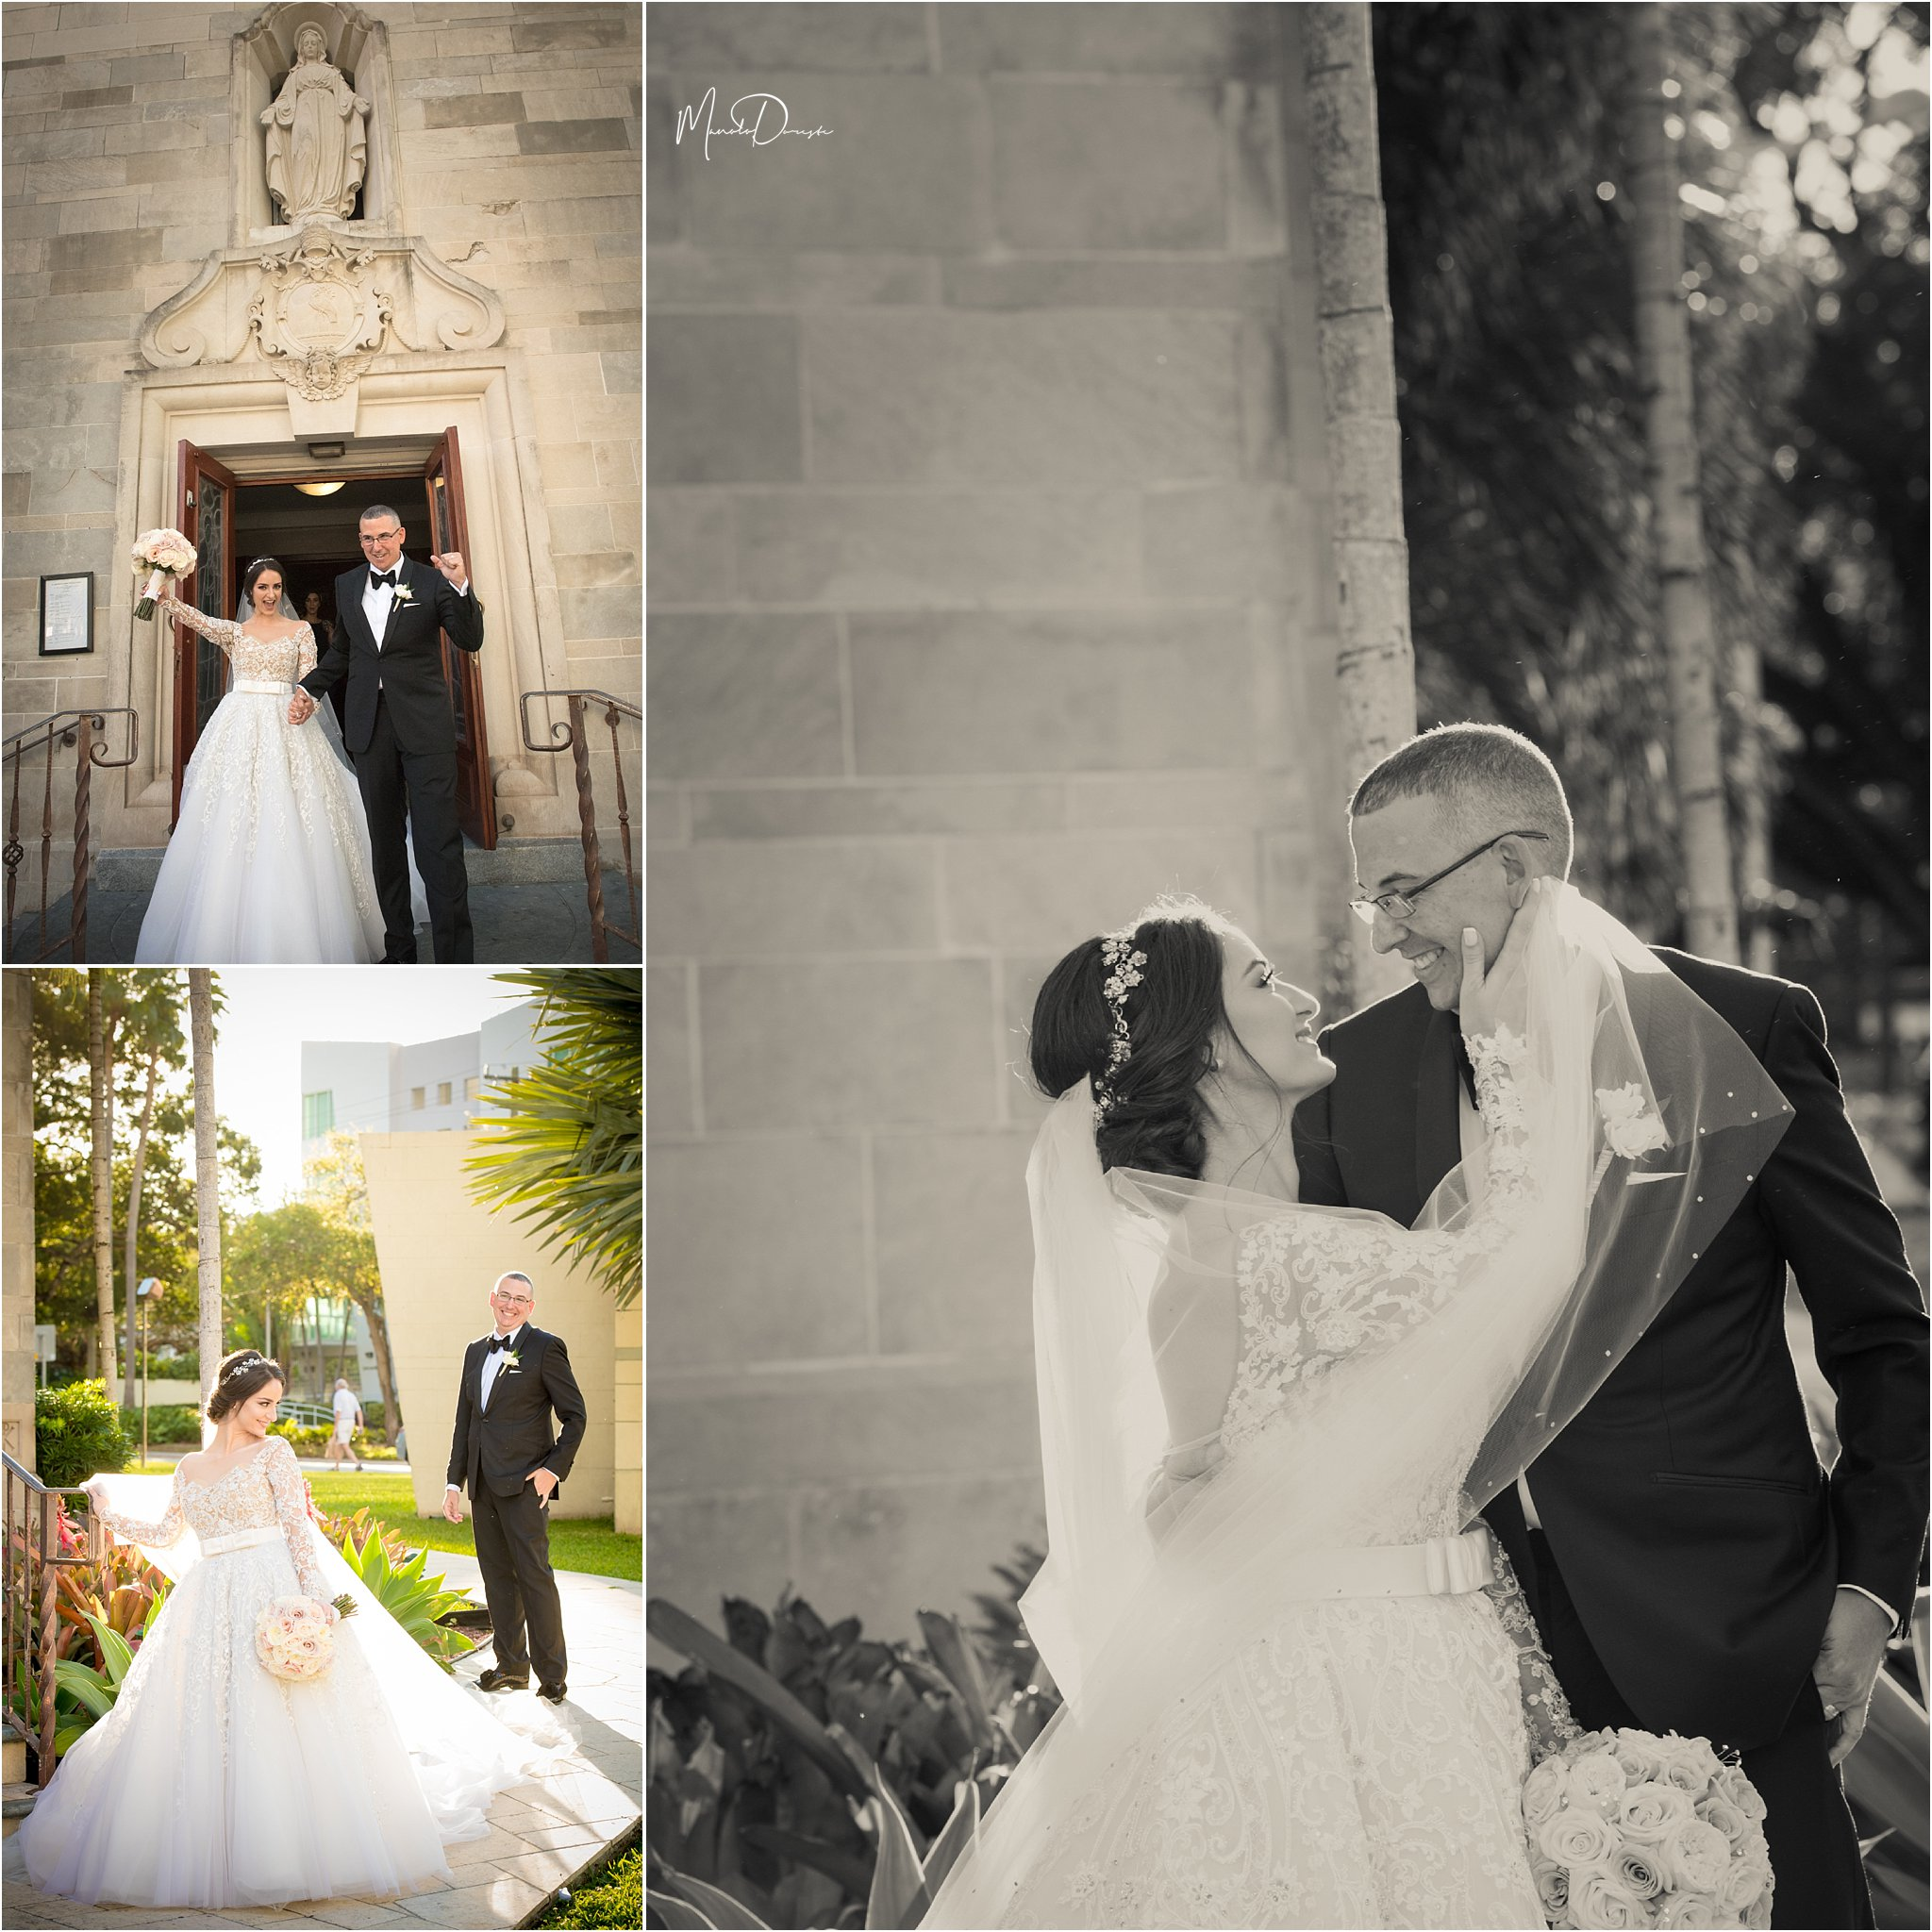 00724_ManoloDoreste_InFocusStudios_Wedding_Family_Photography_Miami_MiamiPhotographer.jpg